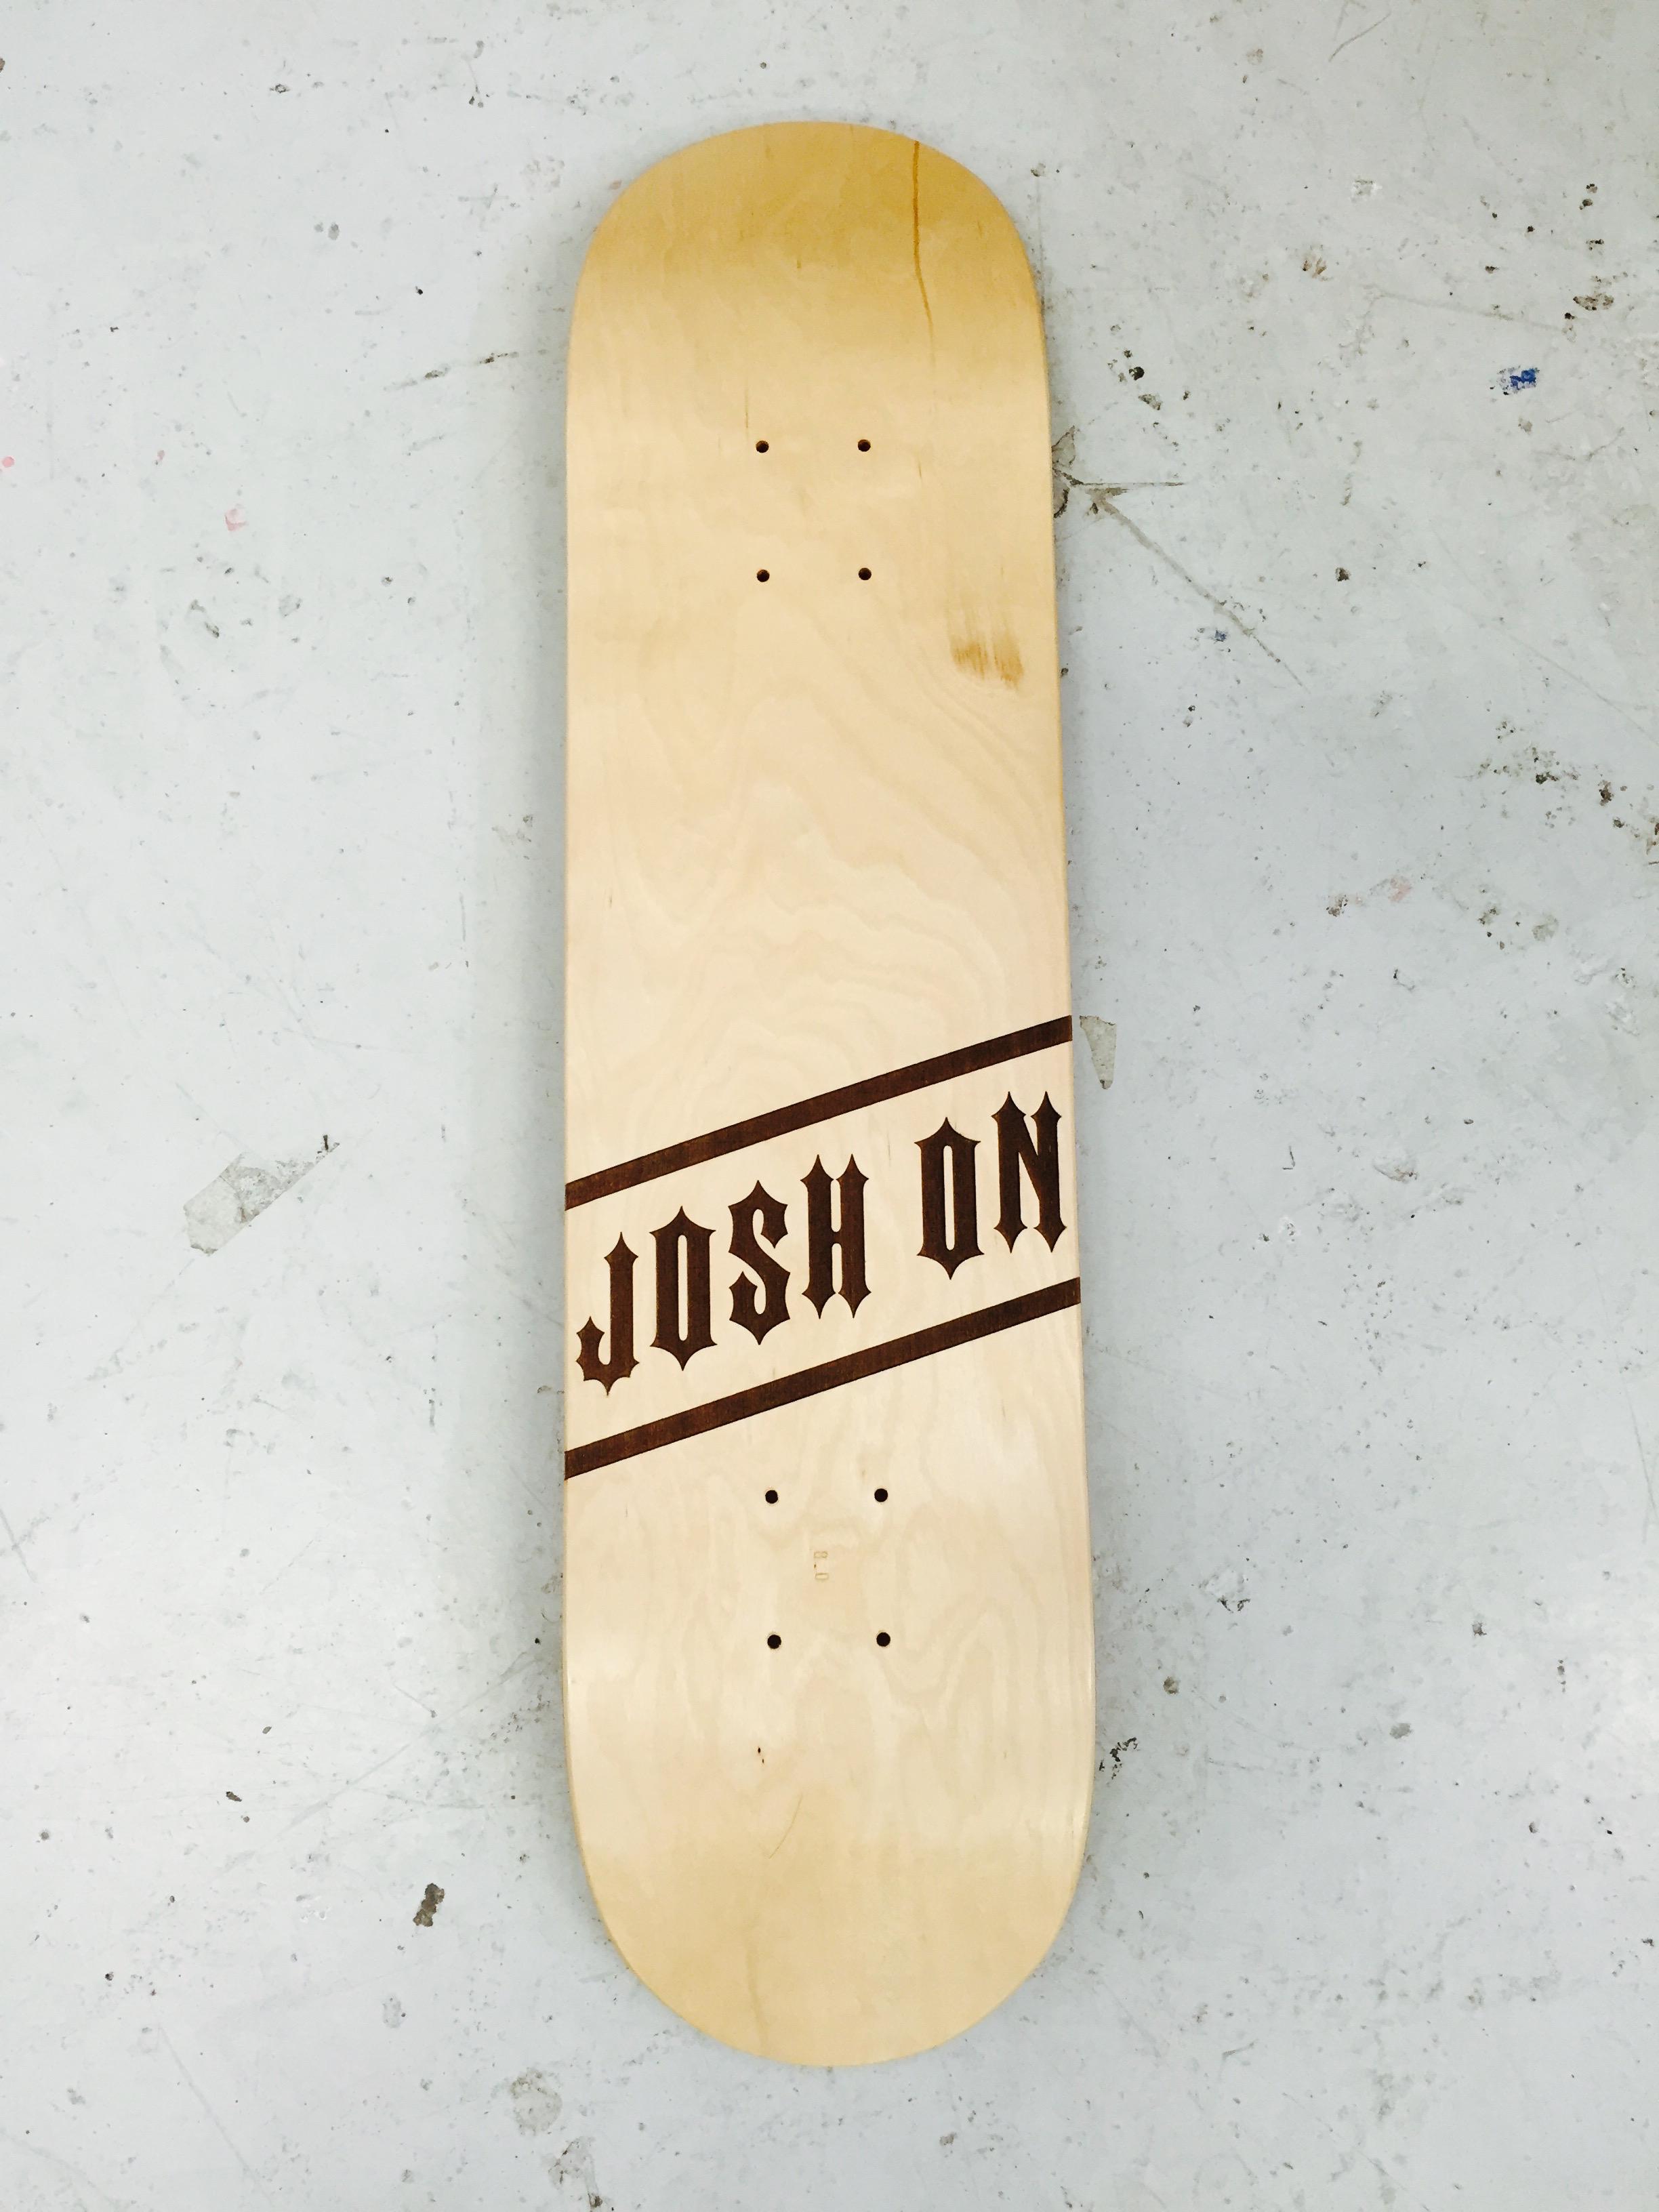 JOSH ON - SKATEBOARDER